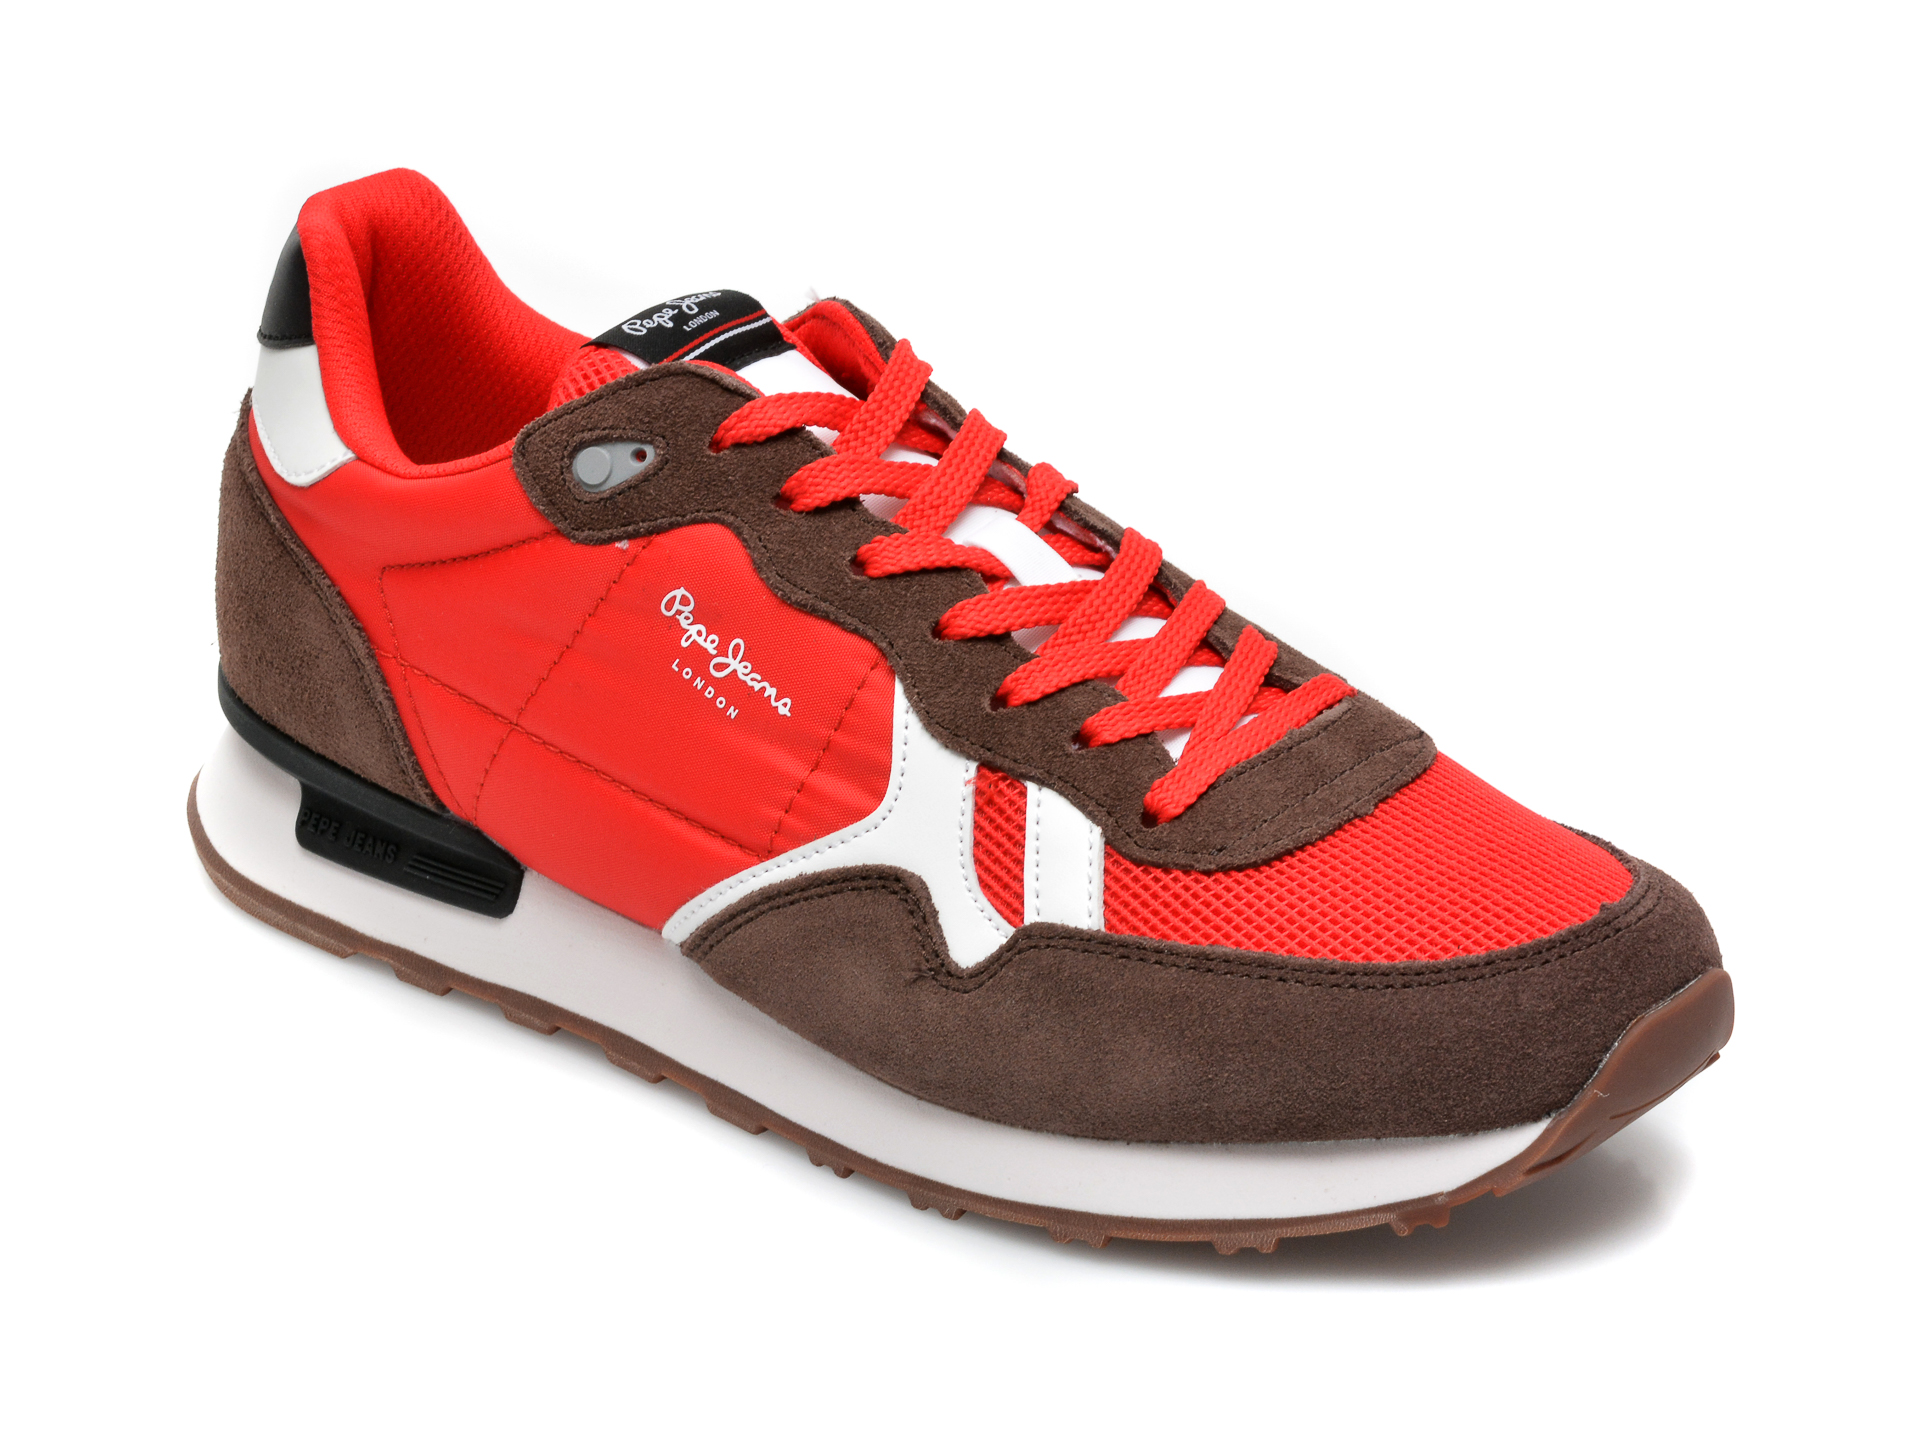 Pantofi sport PEPE JEANS rosii, 3072199, din material textil si piele naturala imagine